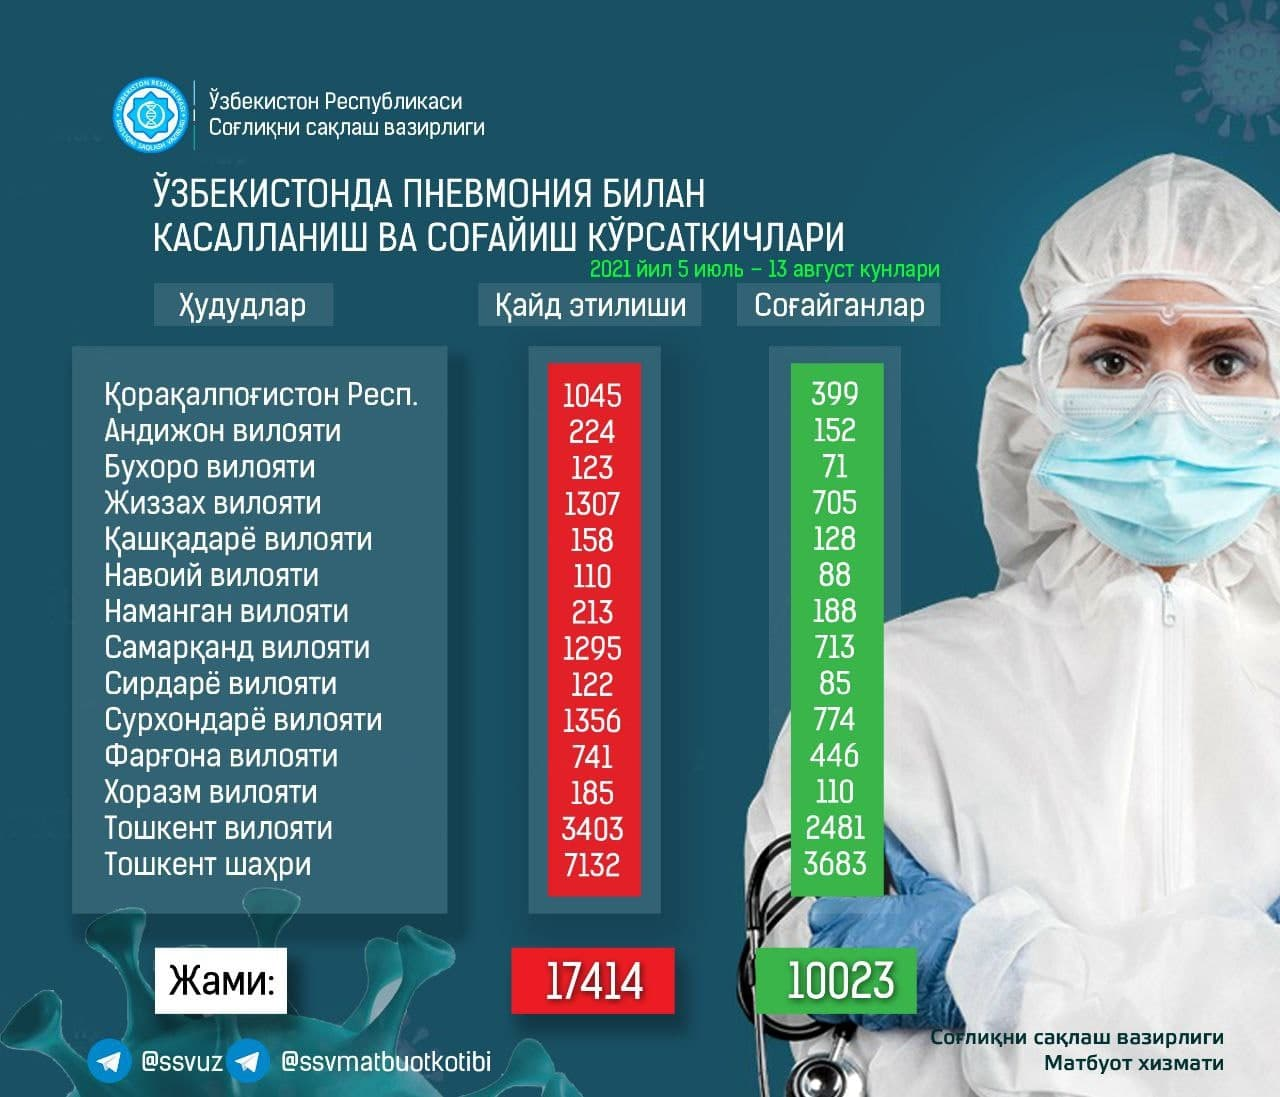 Опубликована свежая статистика по пневмонии